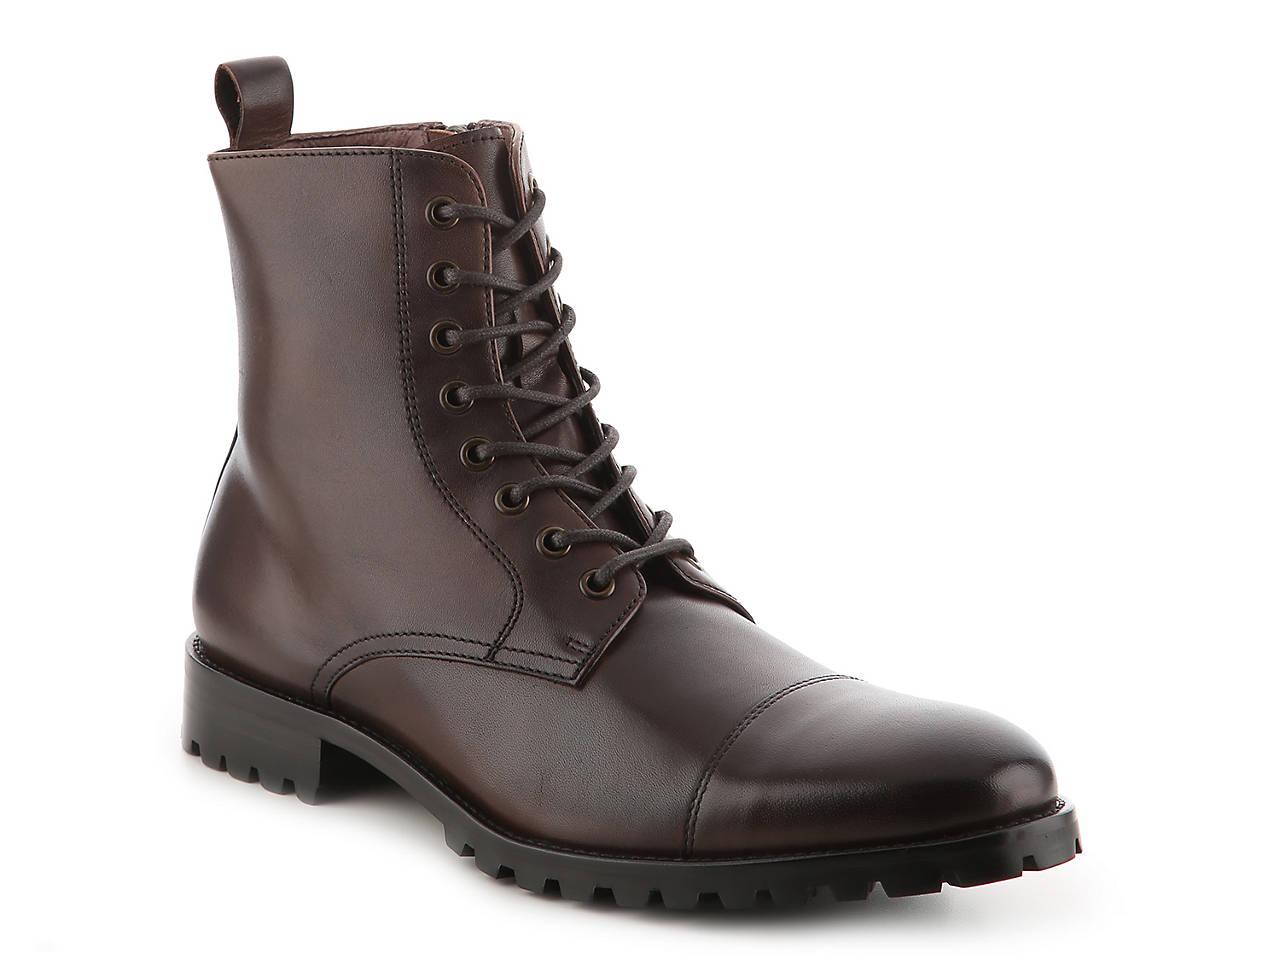 31bc3c1fcd13 Blake McKay M8 Cap Toe Boot Men s Shoes